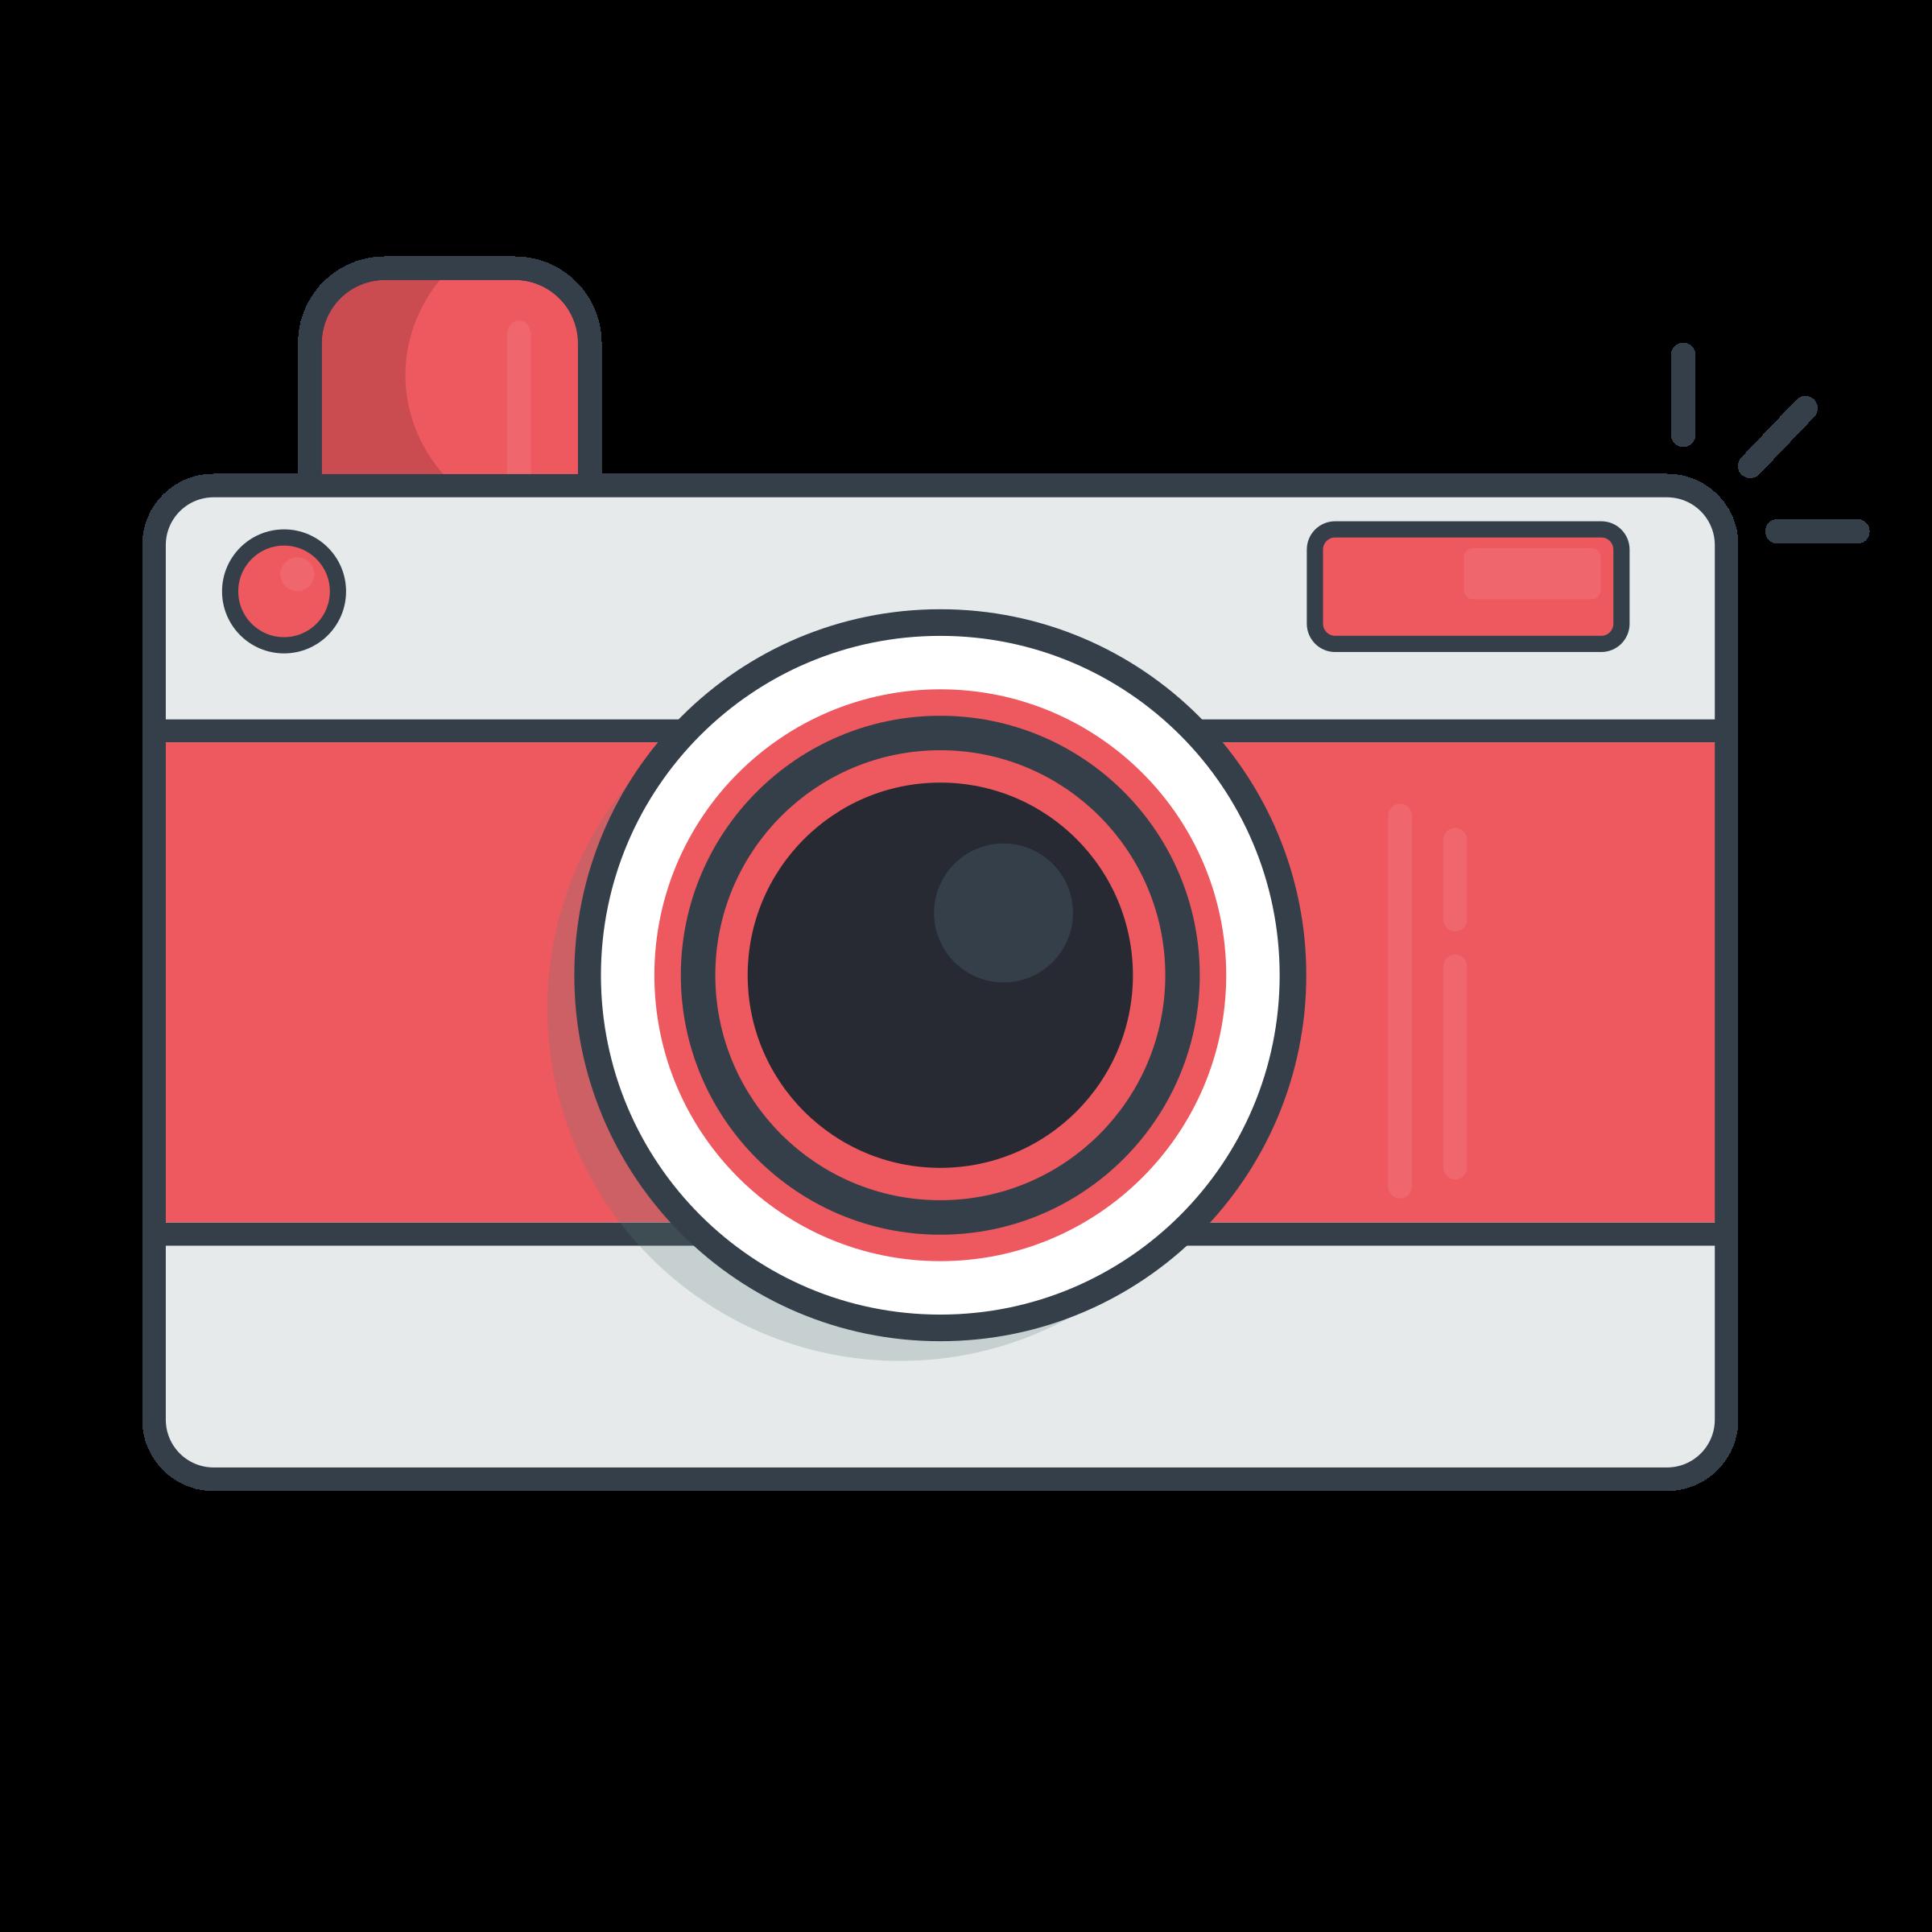 clip free stock Camera clipart. Kamera big image png.